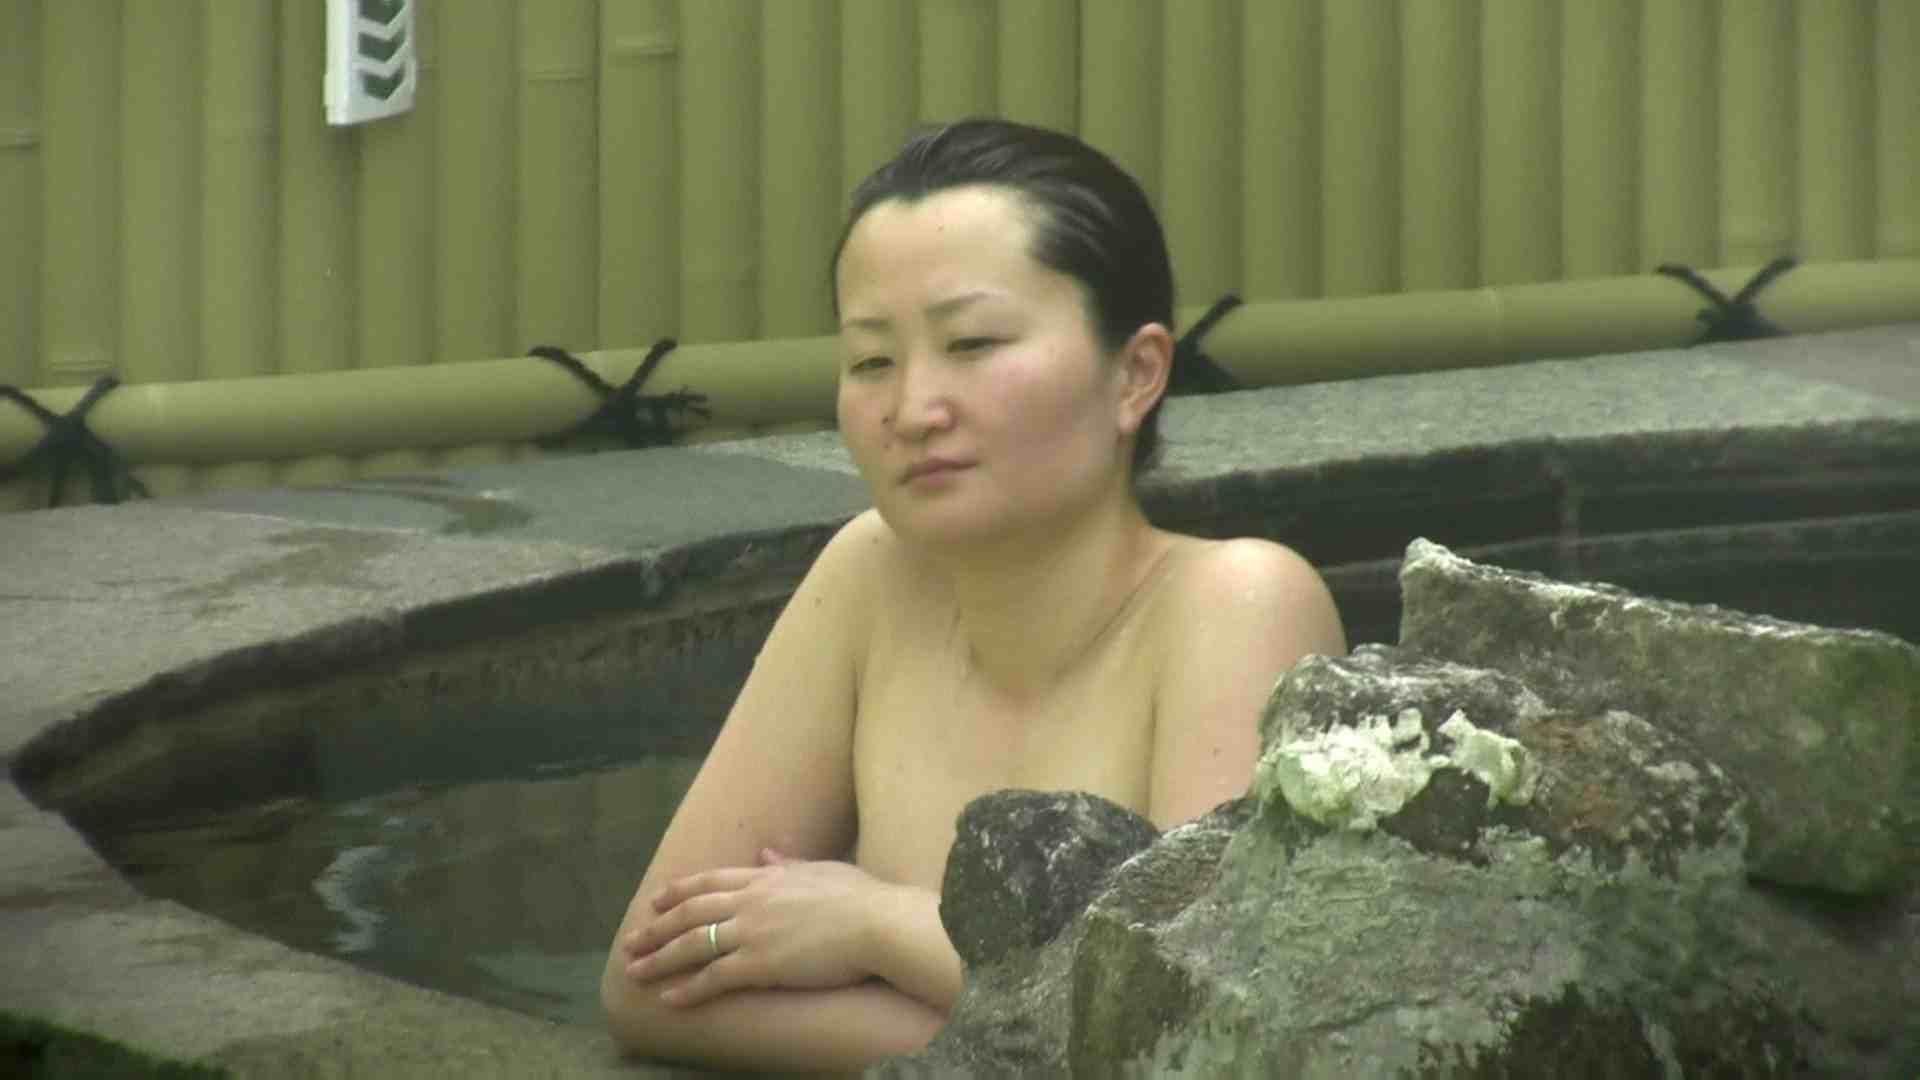 Aquaな露天風呂Vol.632 盗撮シリーズ | 露天風呂編  100PIX 21